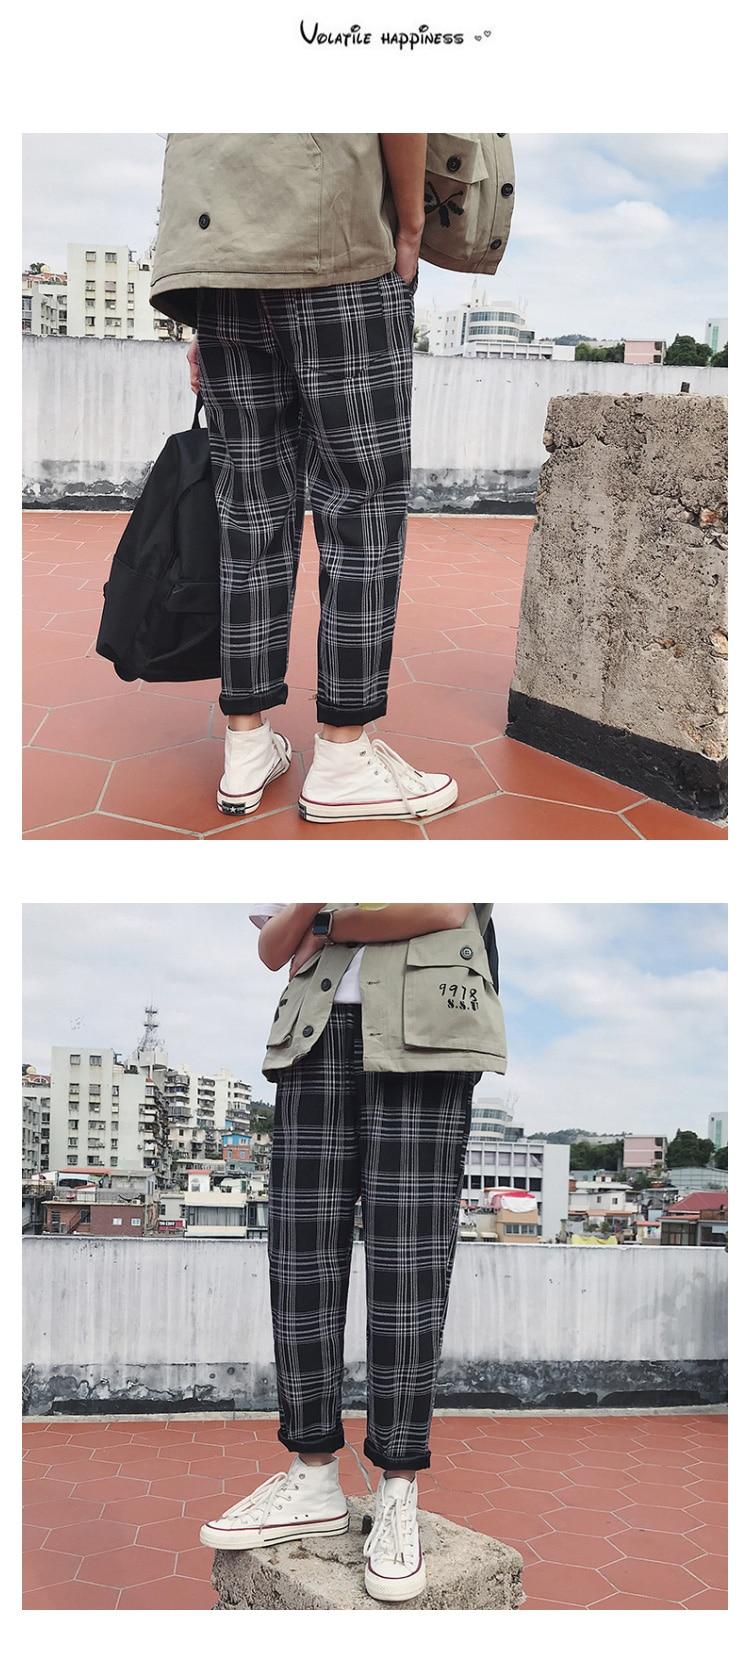 HTB1Ay1qbsrrK1RjSspaq6AREXXae LAPPSTER Streetwear Yellow Plaid Pants Men Joggers 2019 Man Casual Straight Harem Pants Men Korean Hip Hop Track Pants Plus Size